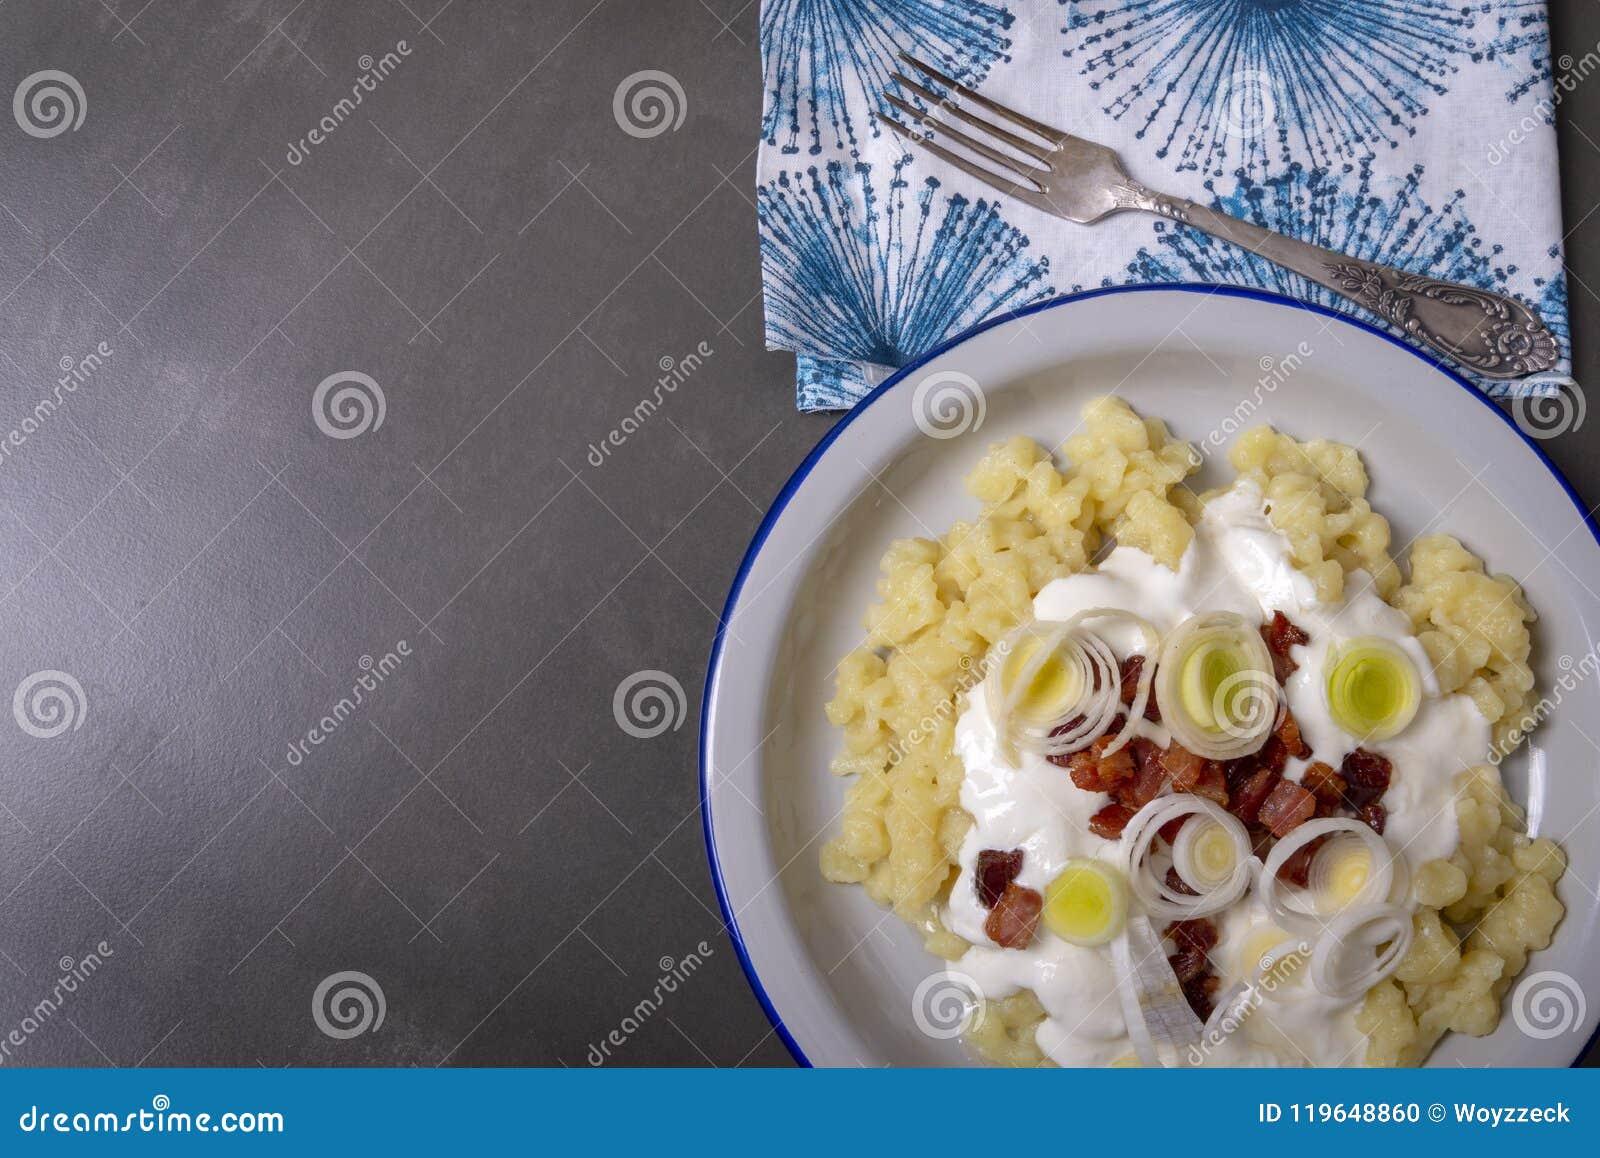 Bryndzove Halusky 斯洛伐克传统烹调